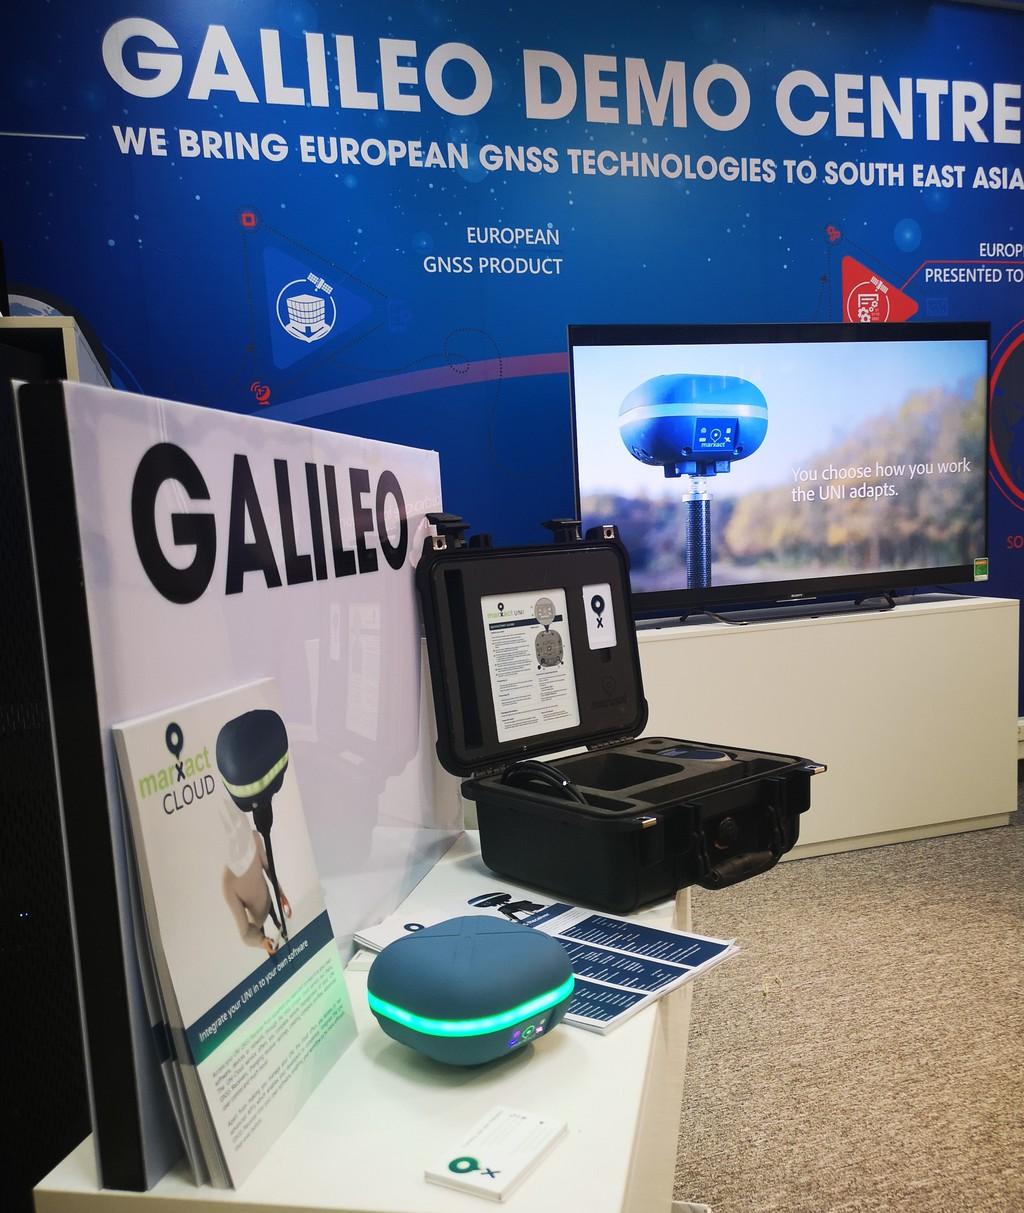 NAVIS Galileo DEMO Centre BELS+ Project Hanoi Vietnam South east asia RTK GNSS RECEIVER API Cloud marXact UNI-Cloud UNI-GR1 GNSS RTK Receiver GPS Glonass Beidou Galileo L1 L2 L5 GIS BIM CLOUD Telecom digitaal inmeten VRS Caster Europe